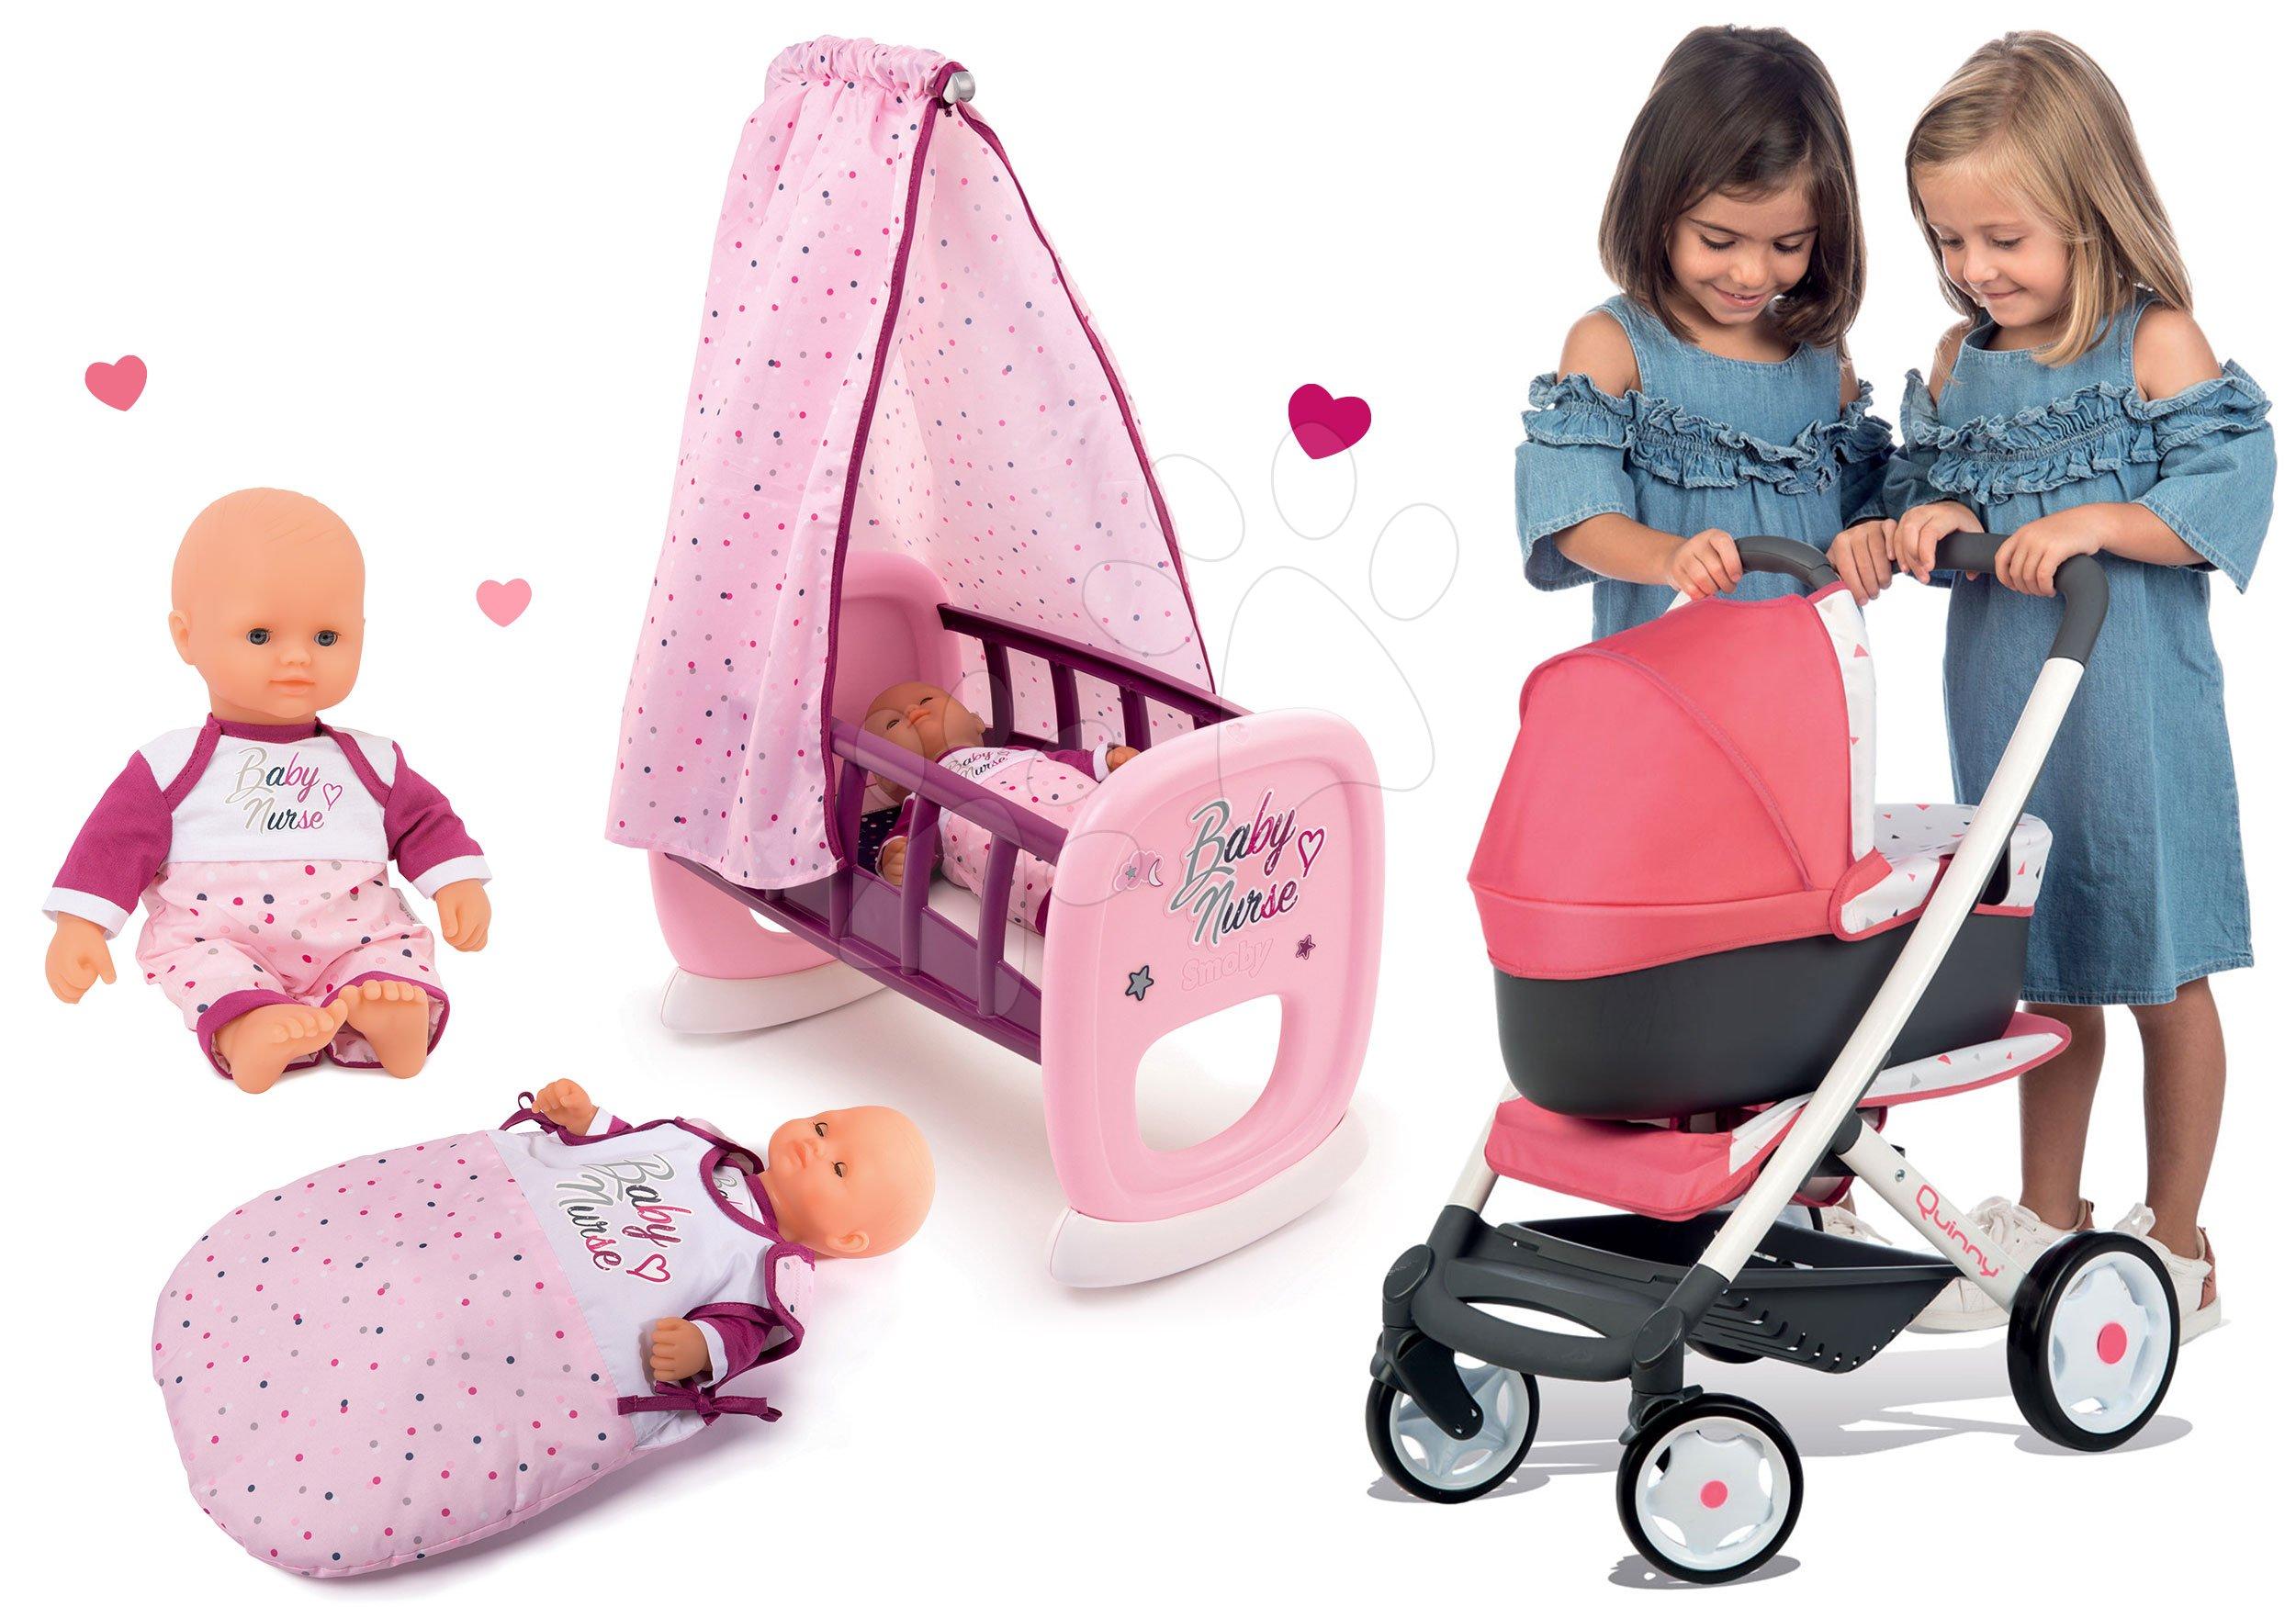 Set kočárek hluboký trojkombinace Trio Pastel Maxi Cosi & Quinny 3v1 Smoby a kolébka se spacím pytlem a panenka Violette Baby Nurse 32 cm